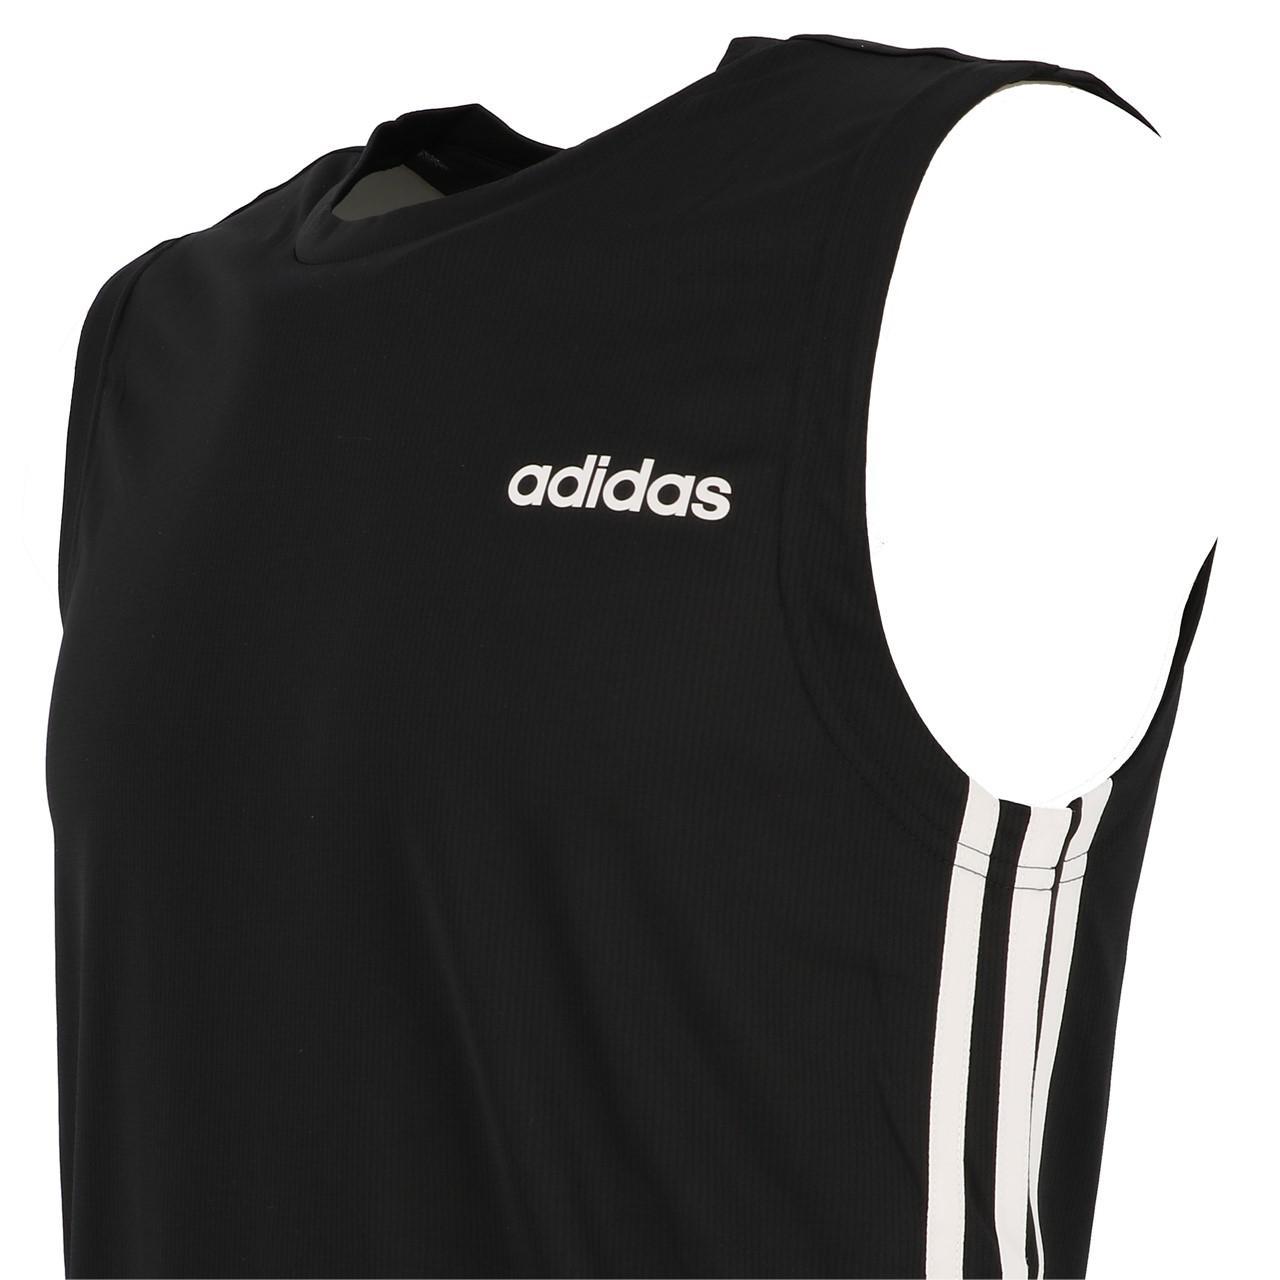 Sleeveless-Shirt-Adidas-D2m-Sl-3s-Blk-Sm-Tee-Black-90912-New thumbnail 3